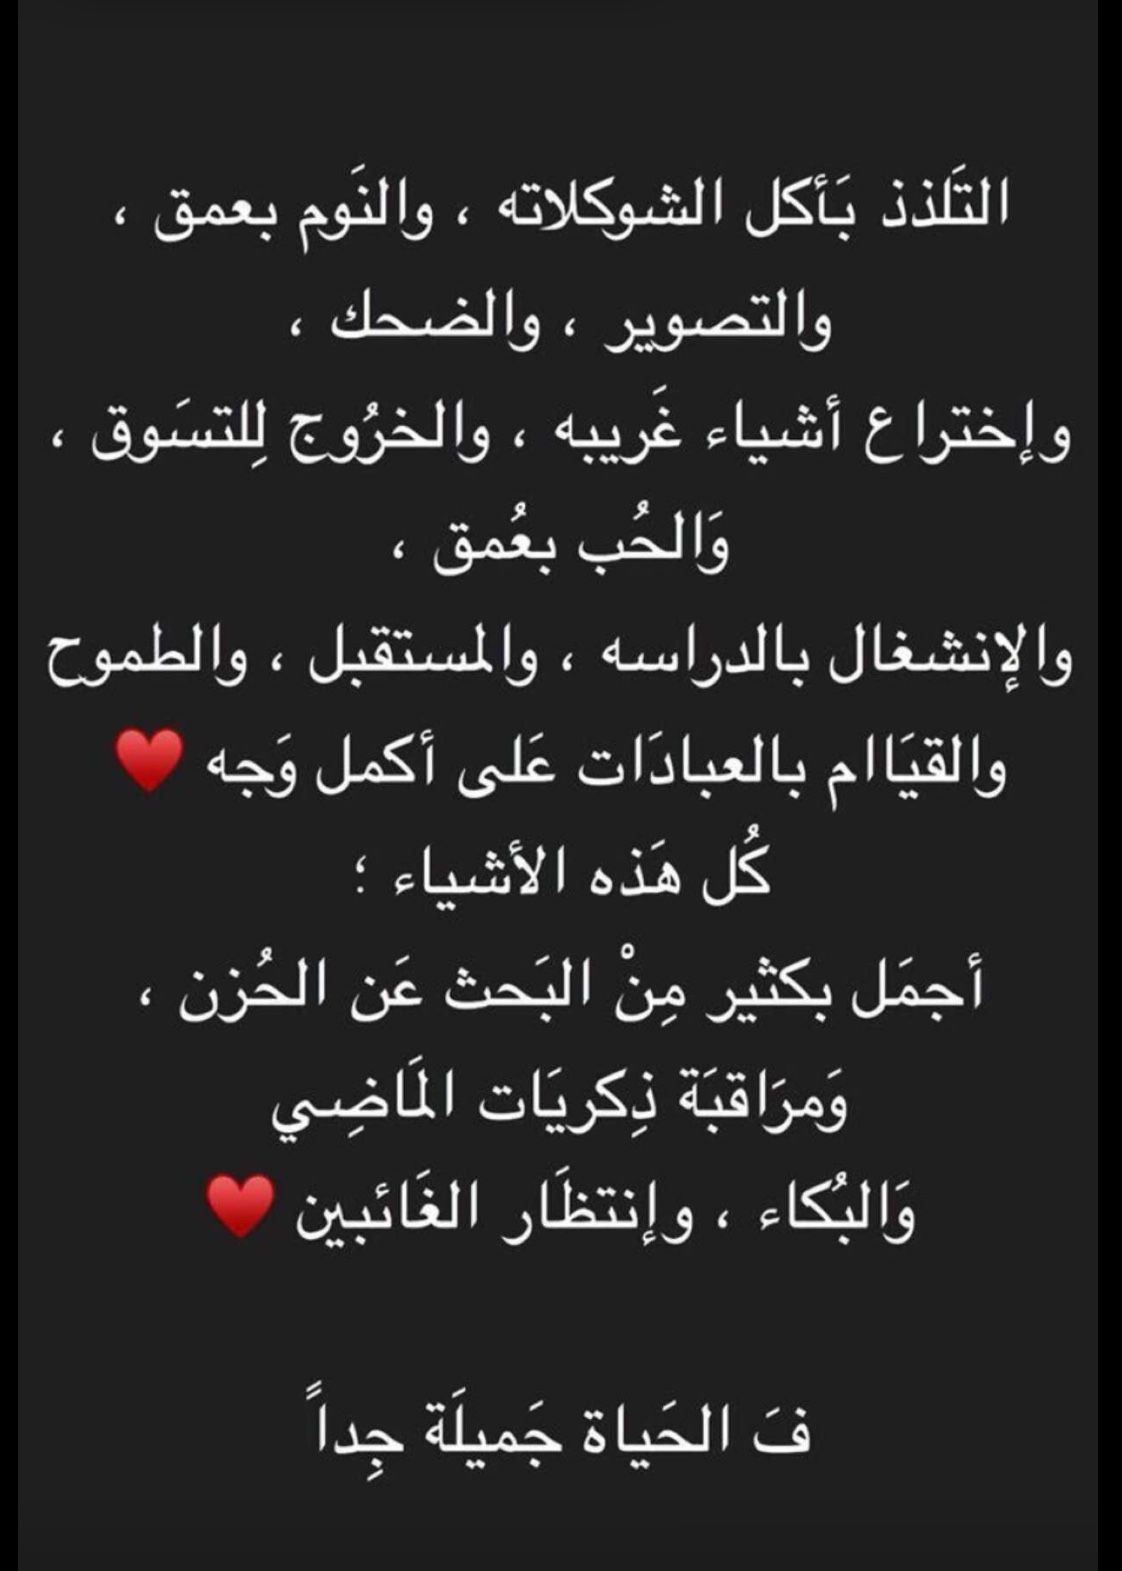 Pin By Khairya Khairy On Khairya Arabic Words Arabic Quotes Life Rules